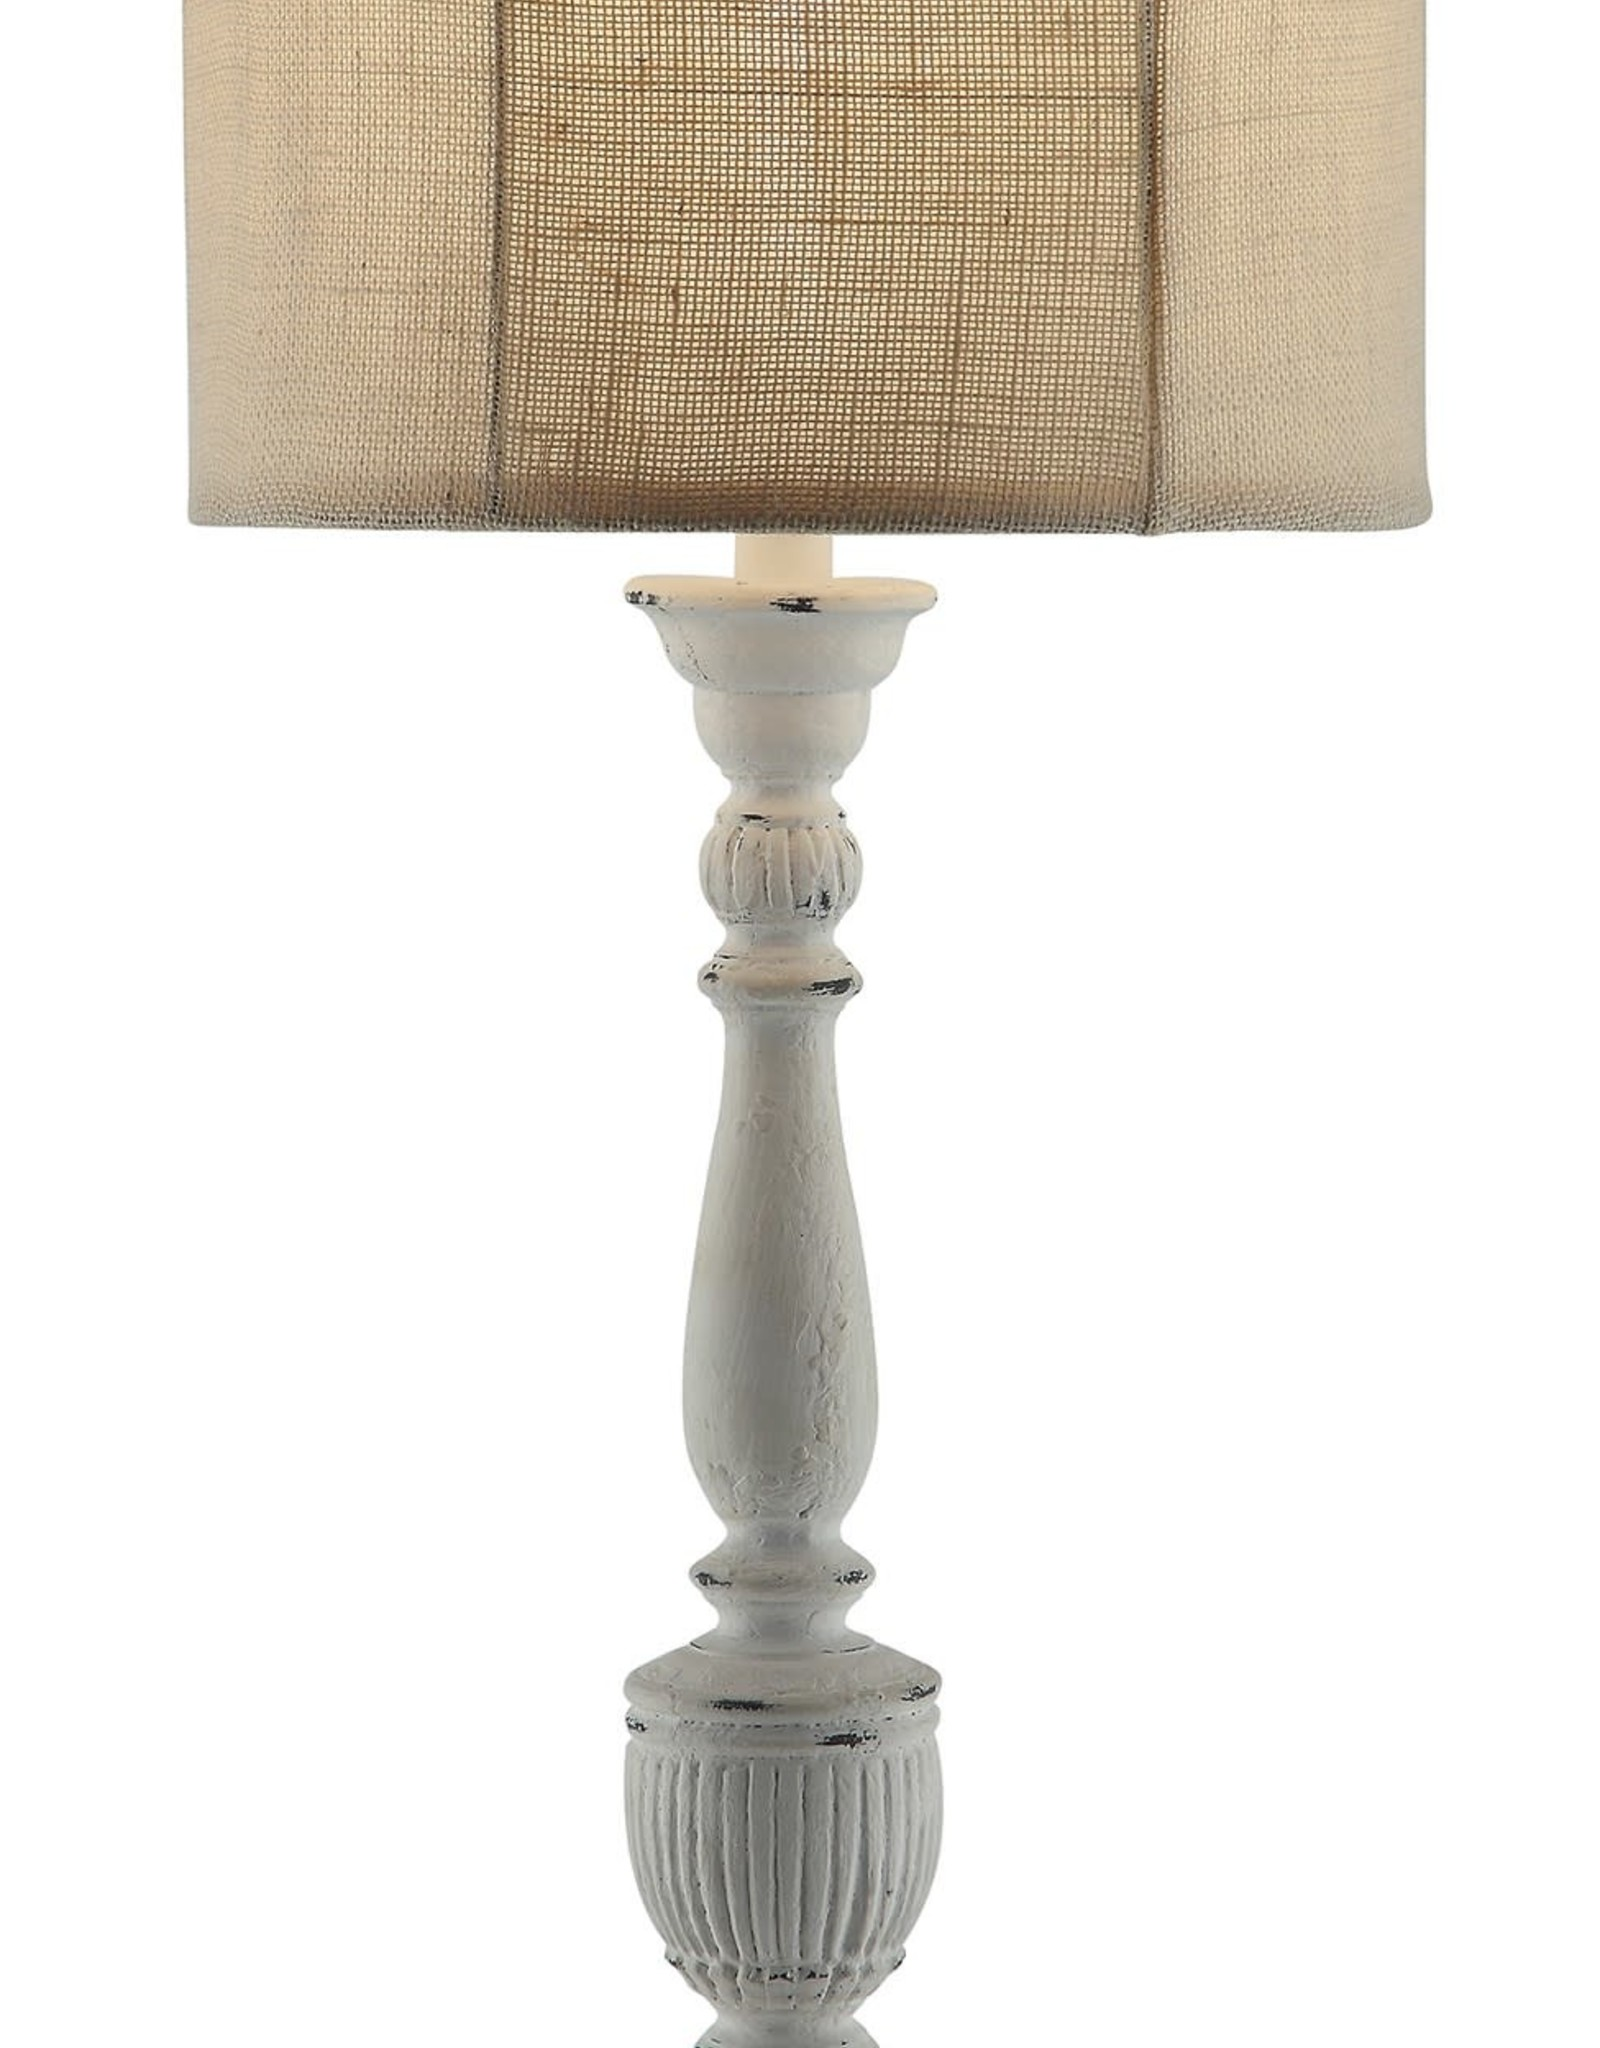 Crestview Layton Table Lamp w/ Burlap Shade